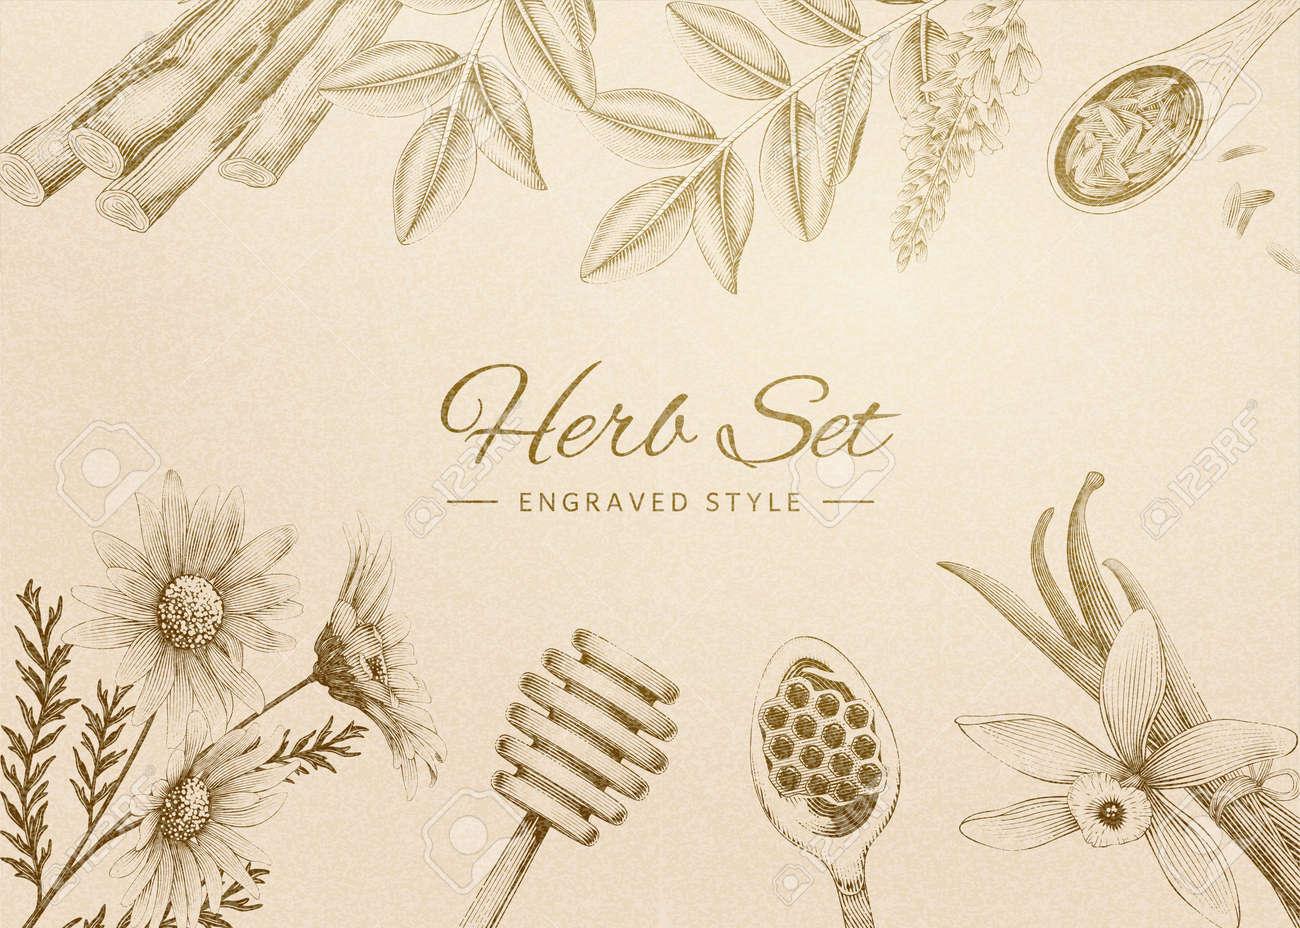 Retro style engraved herbal set on beige - 124277276